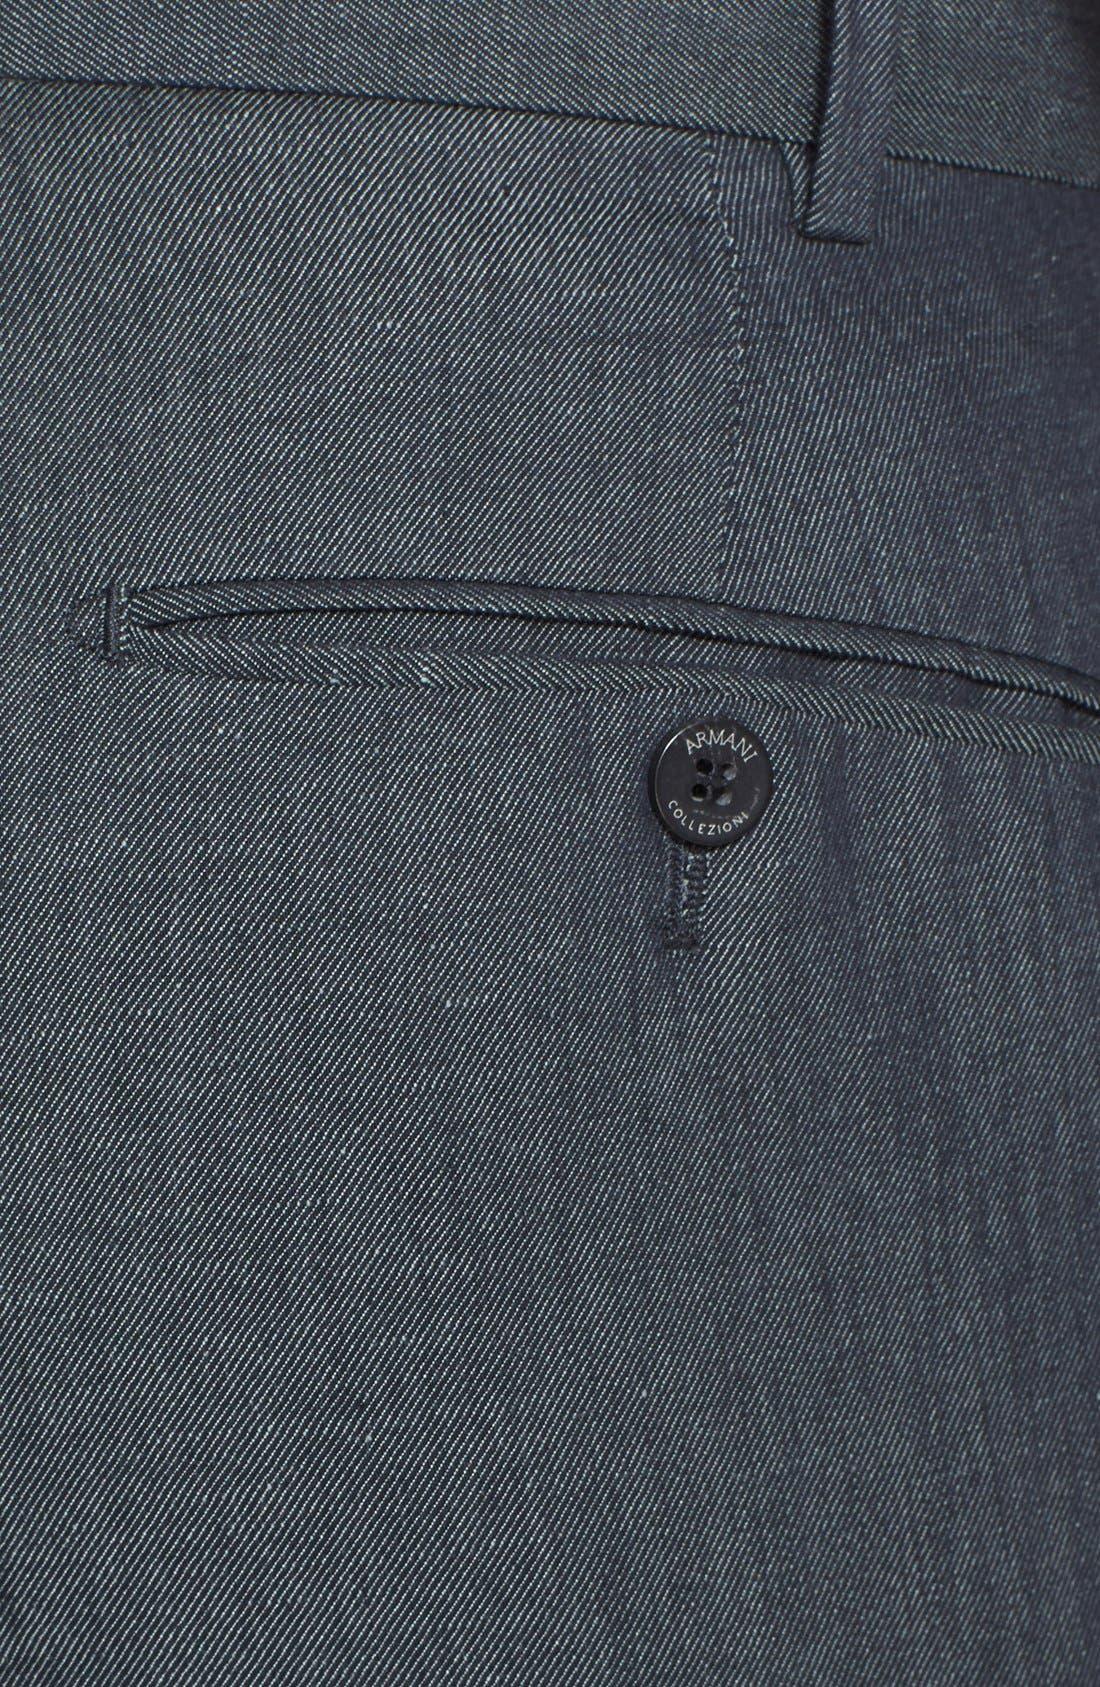 Armani Collezioni Flax & Cotton Flat Front Trousers,                             Alternate thumbnail 4, color,                             034